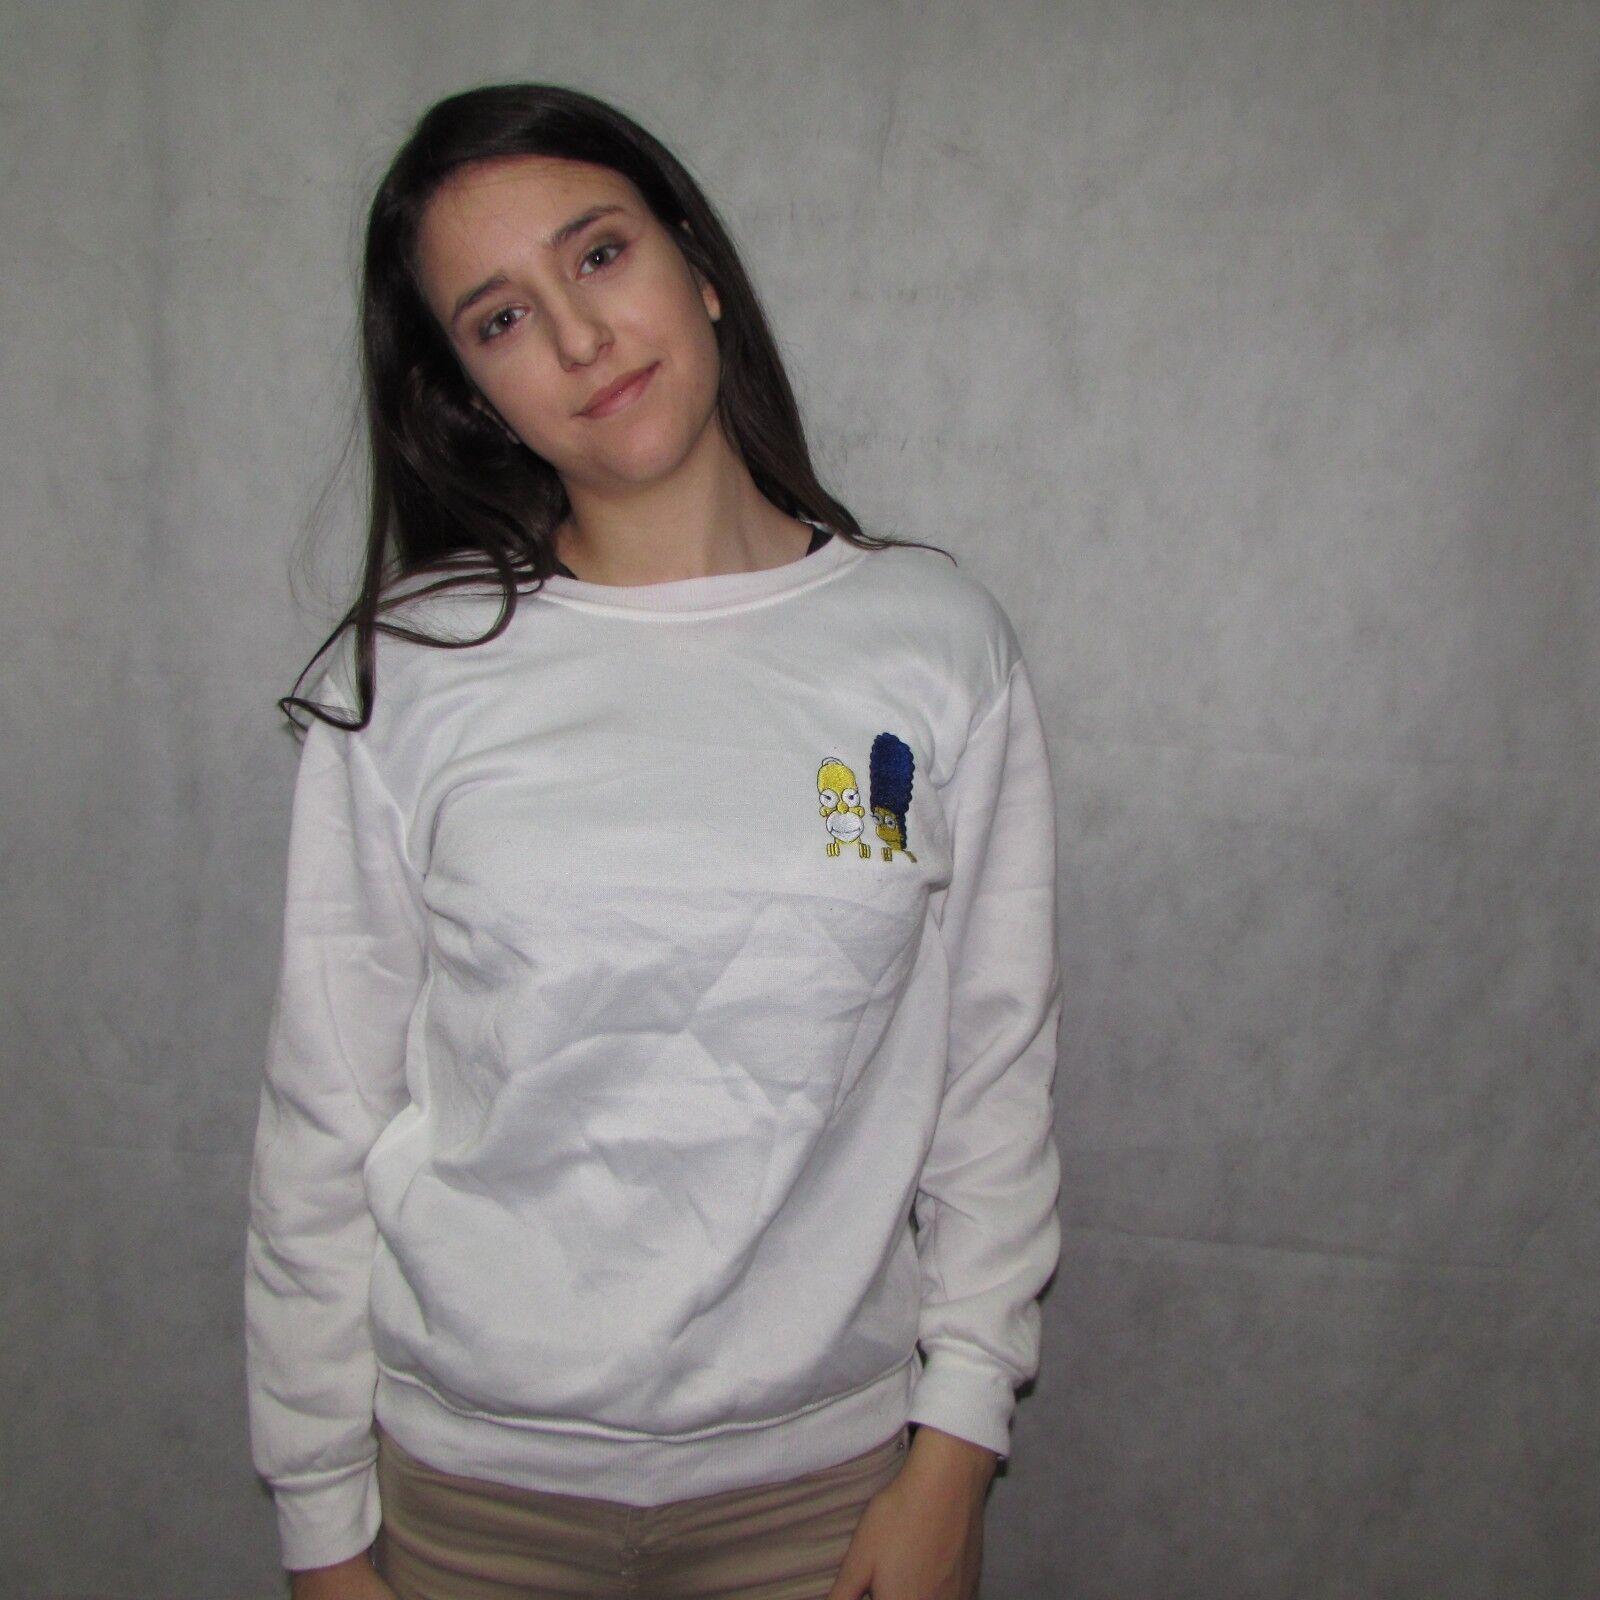 The Simpsons FAMILY True Vintage JUMPER CREW WHITE WHITE WHITE Sweatshirt MEDIUM SIZE WOMENS 2a3353